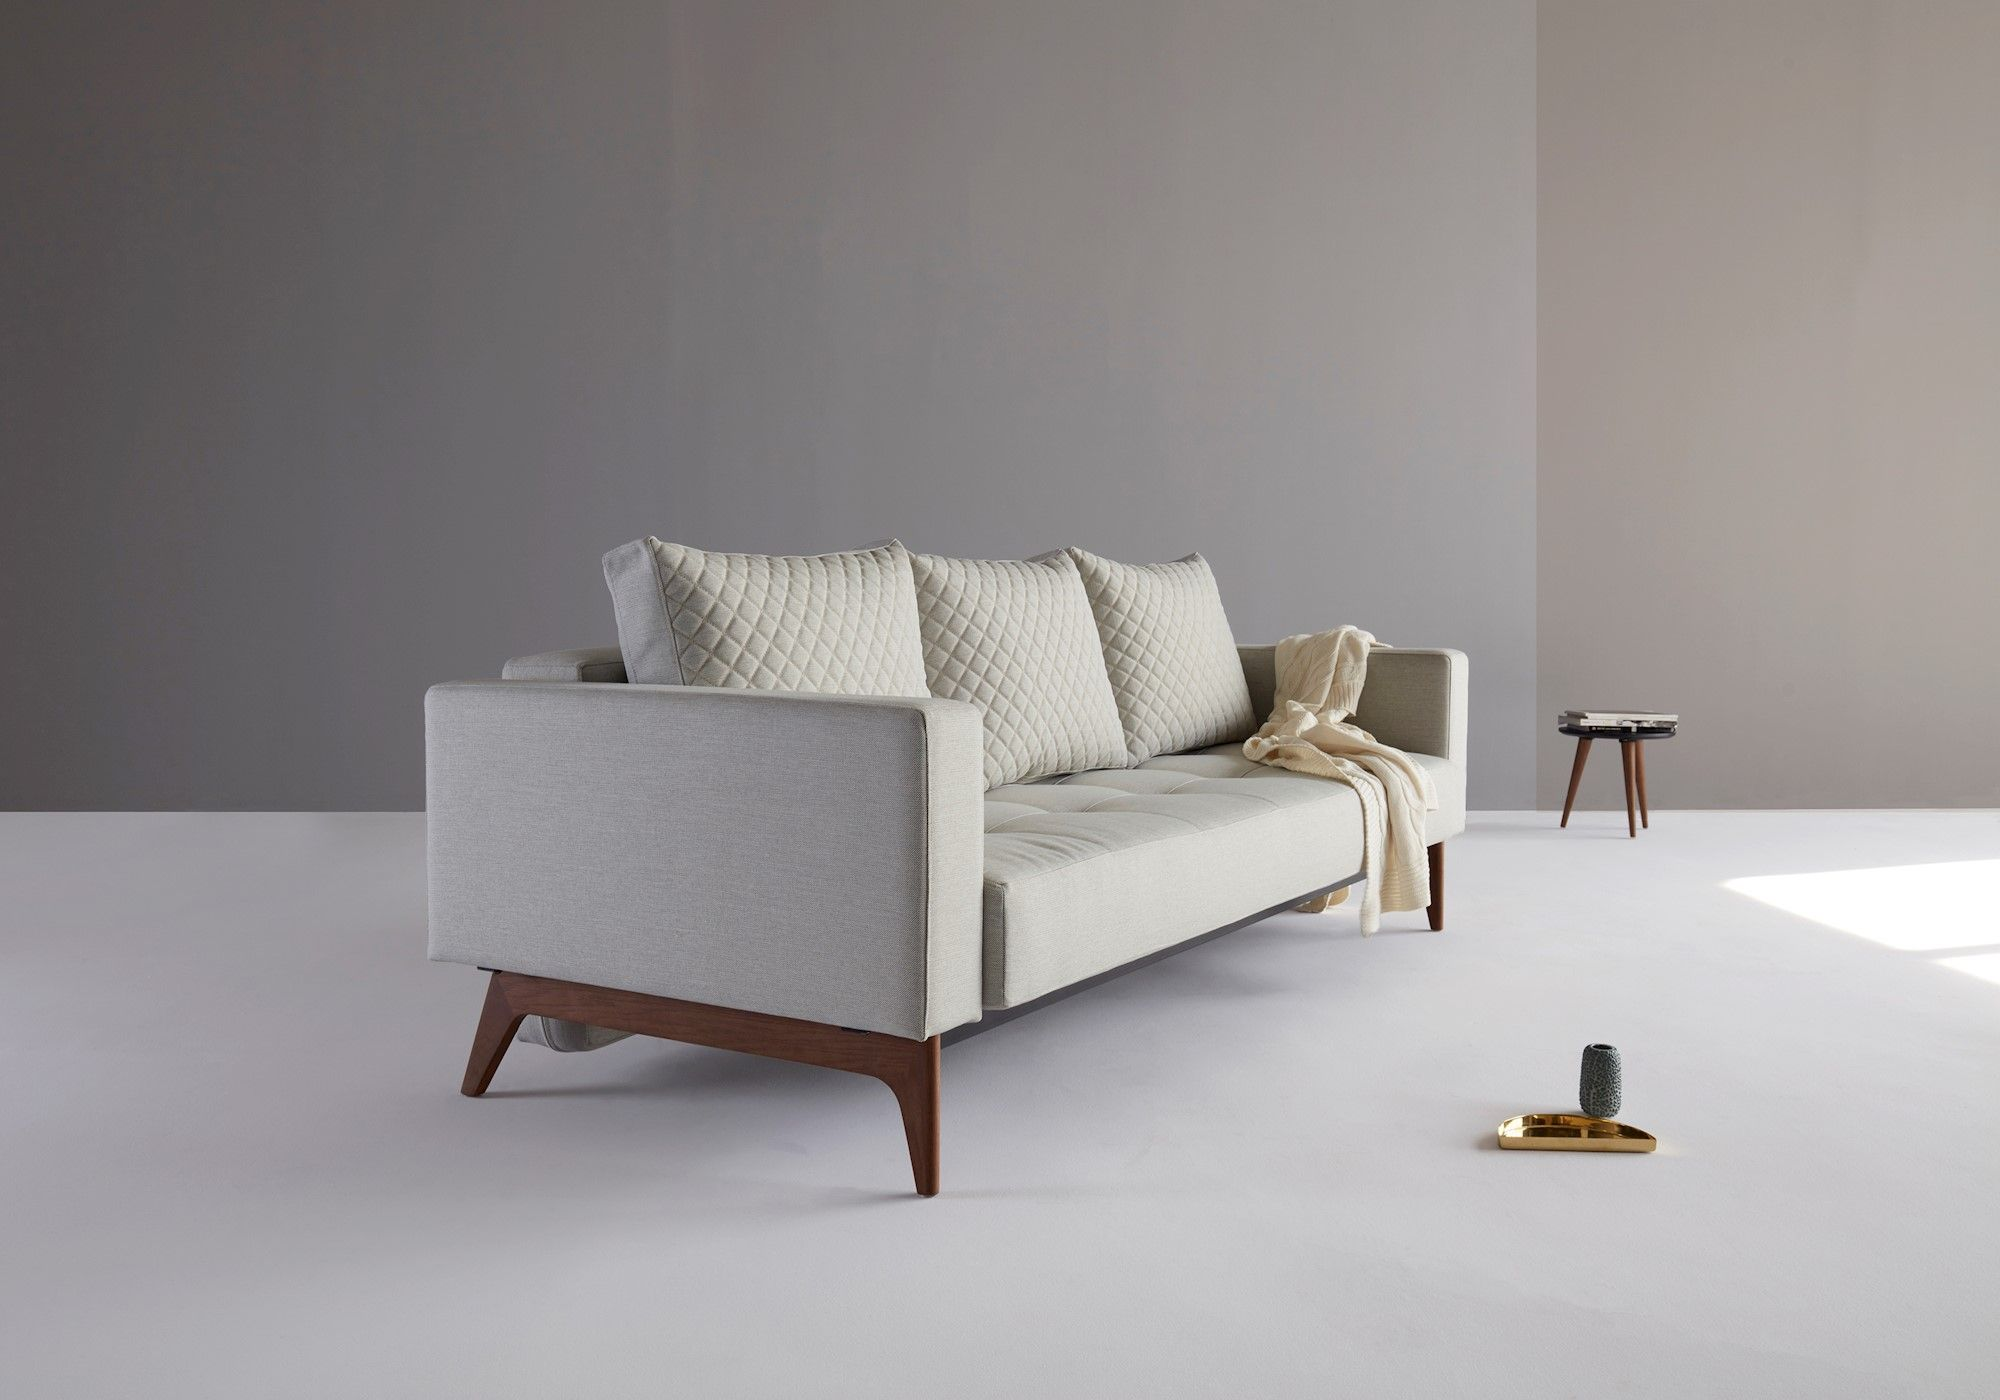 Cassius Quilt Deluxe Walnut Mixed Dance Natural Dark Wood Deluxe Sofas Danish Design Sofa Sofa Colors